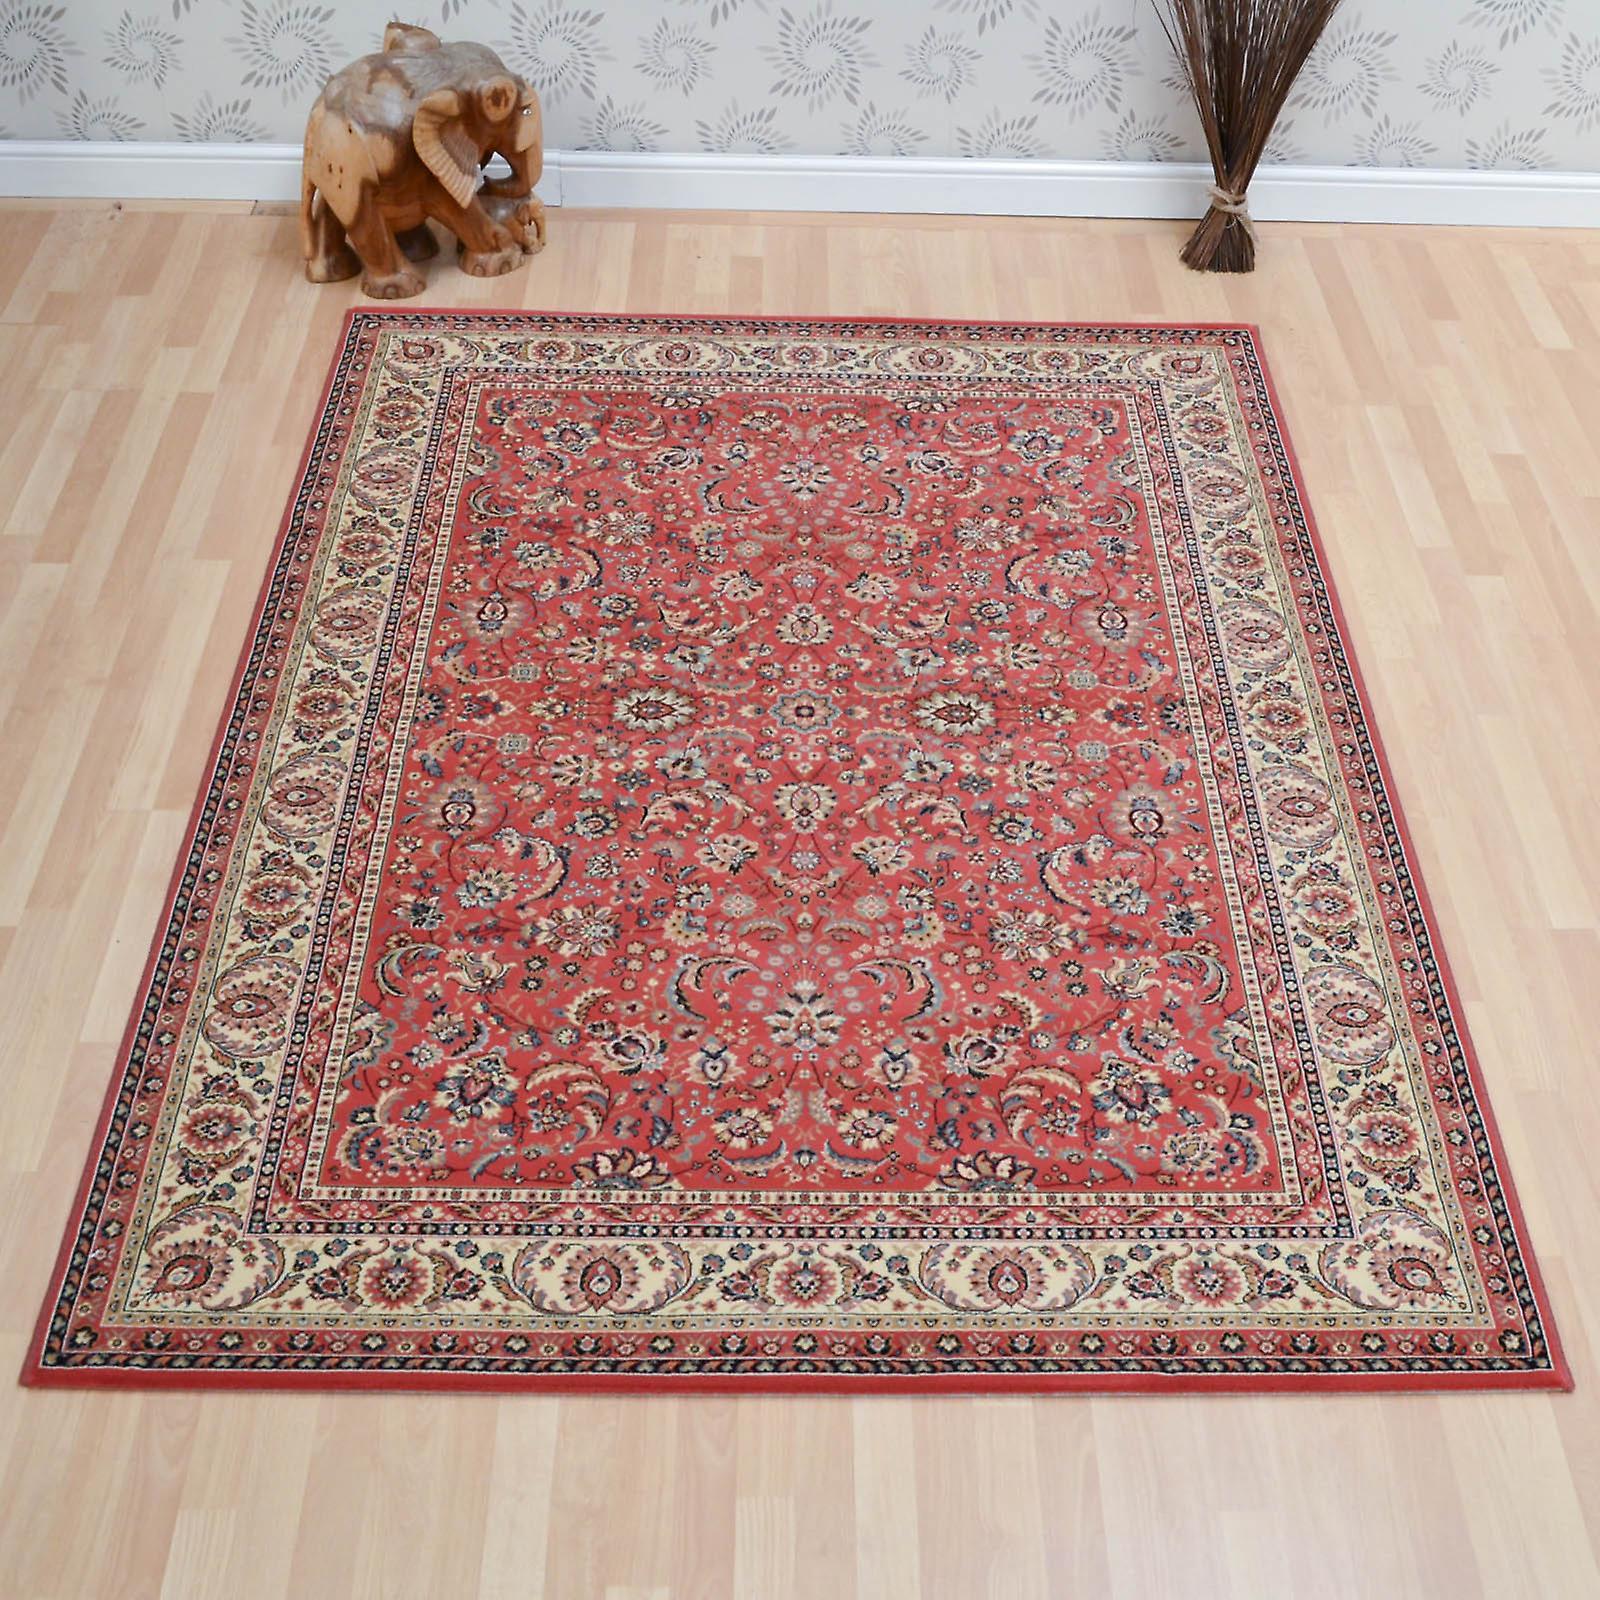 Lano Kasbah alfombras 13720 472 rosa